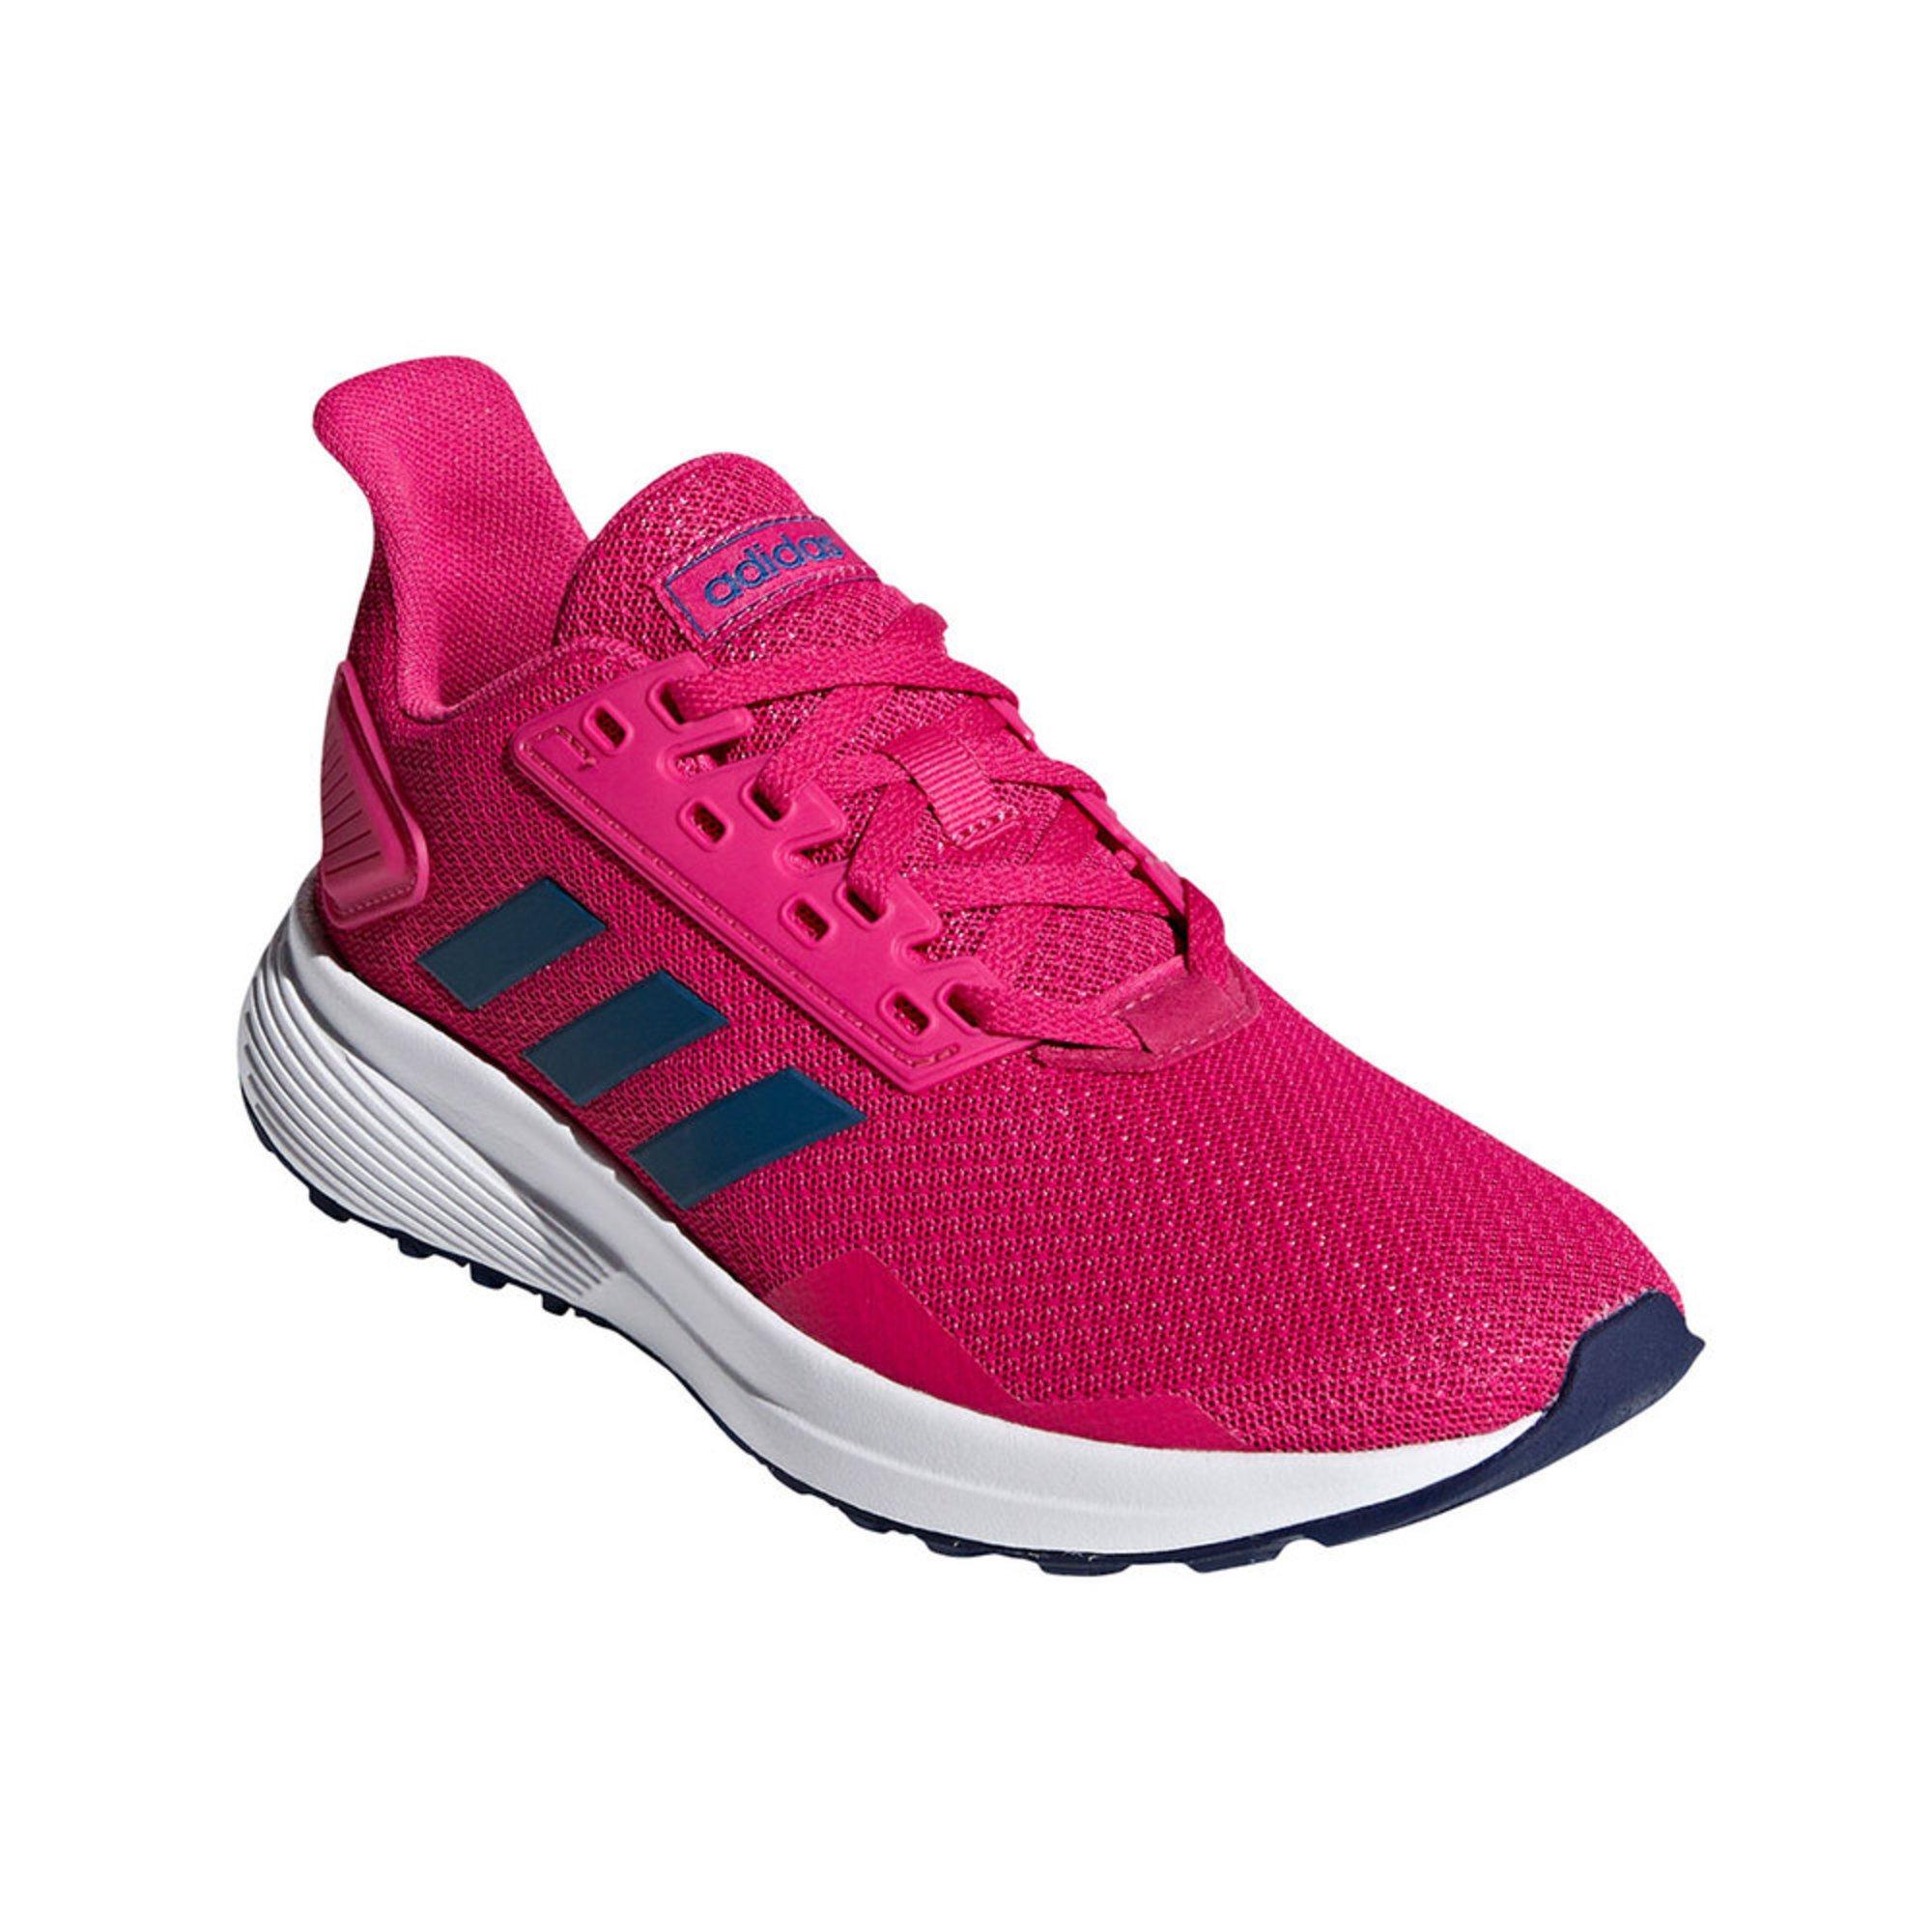 heet Adidas and Upper Playground Shoe Series Adidas and